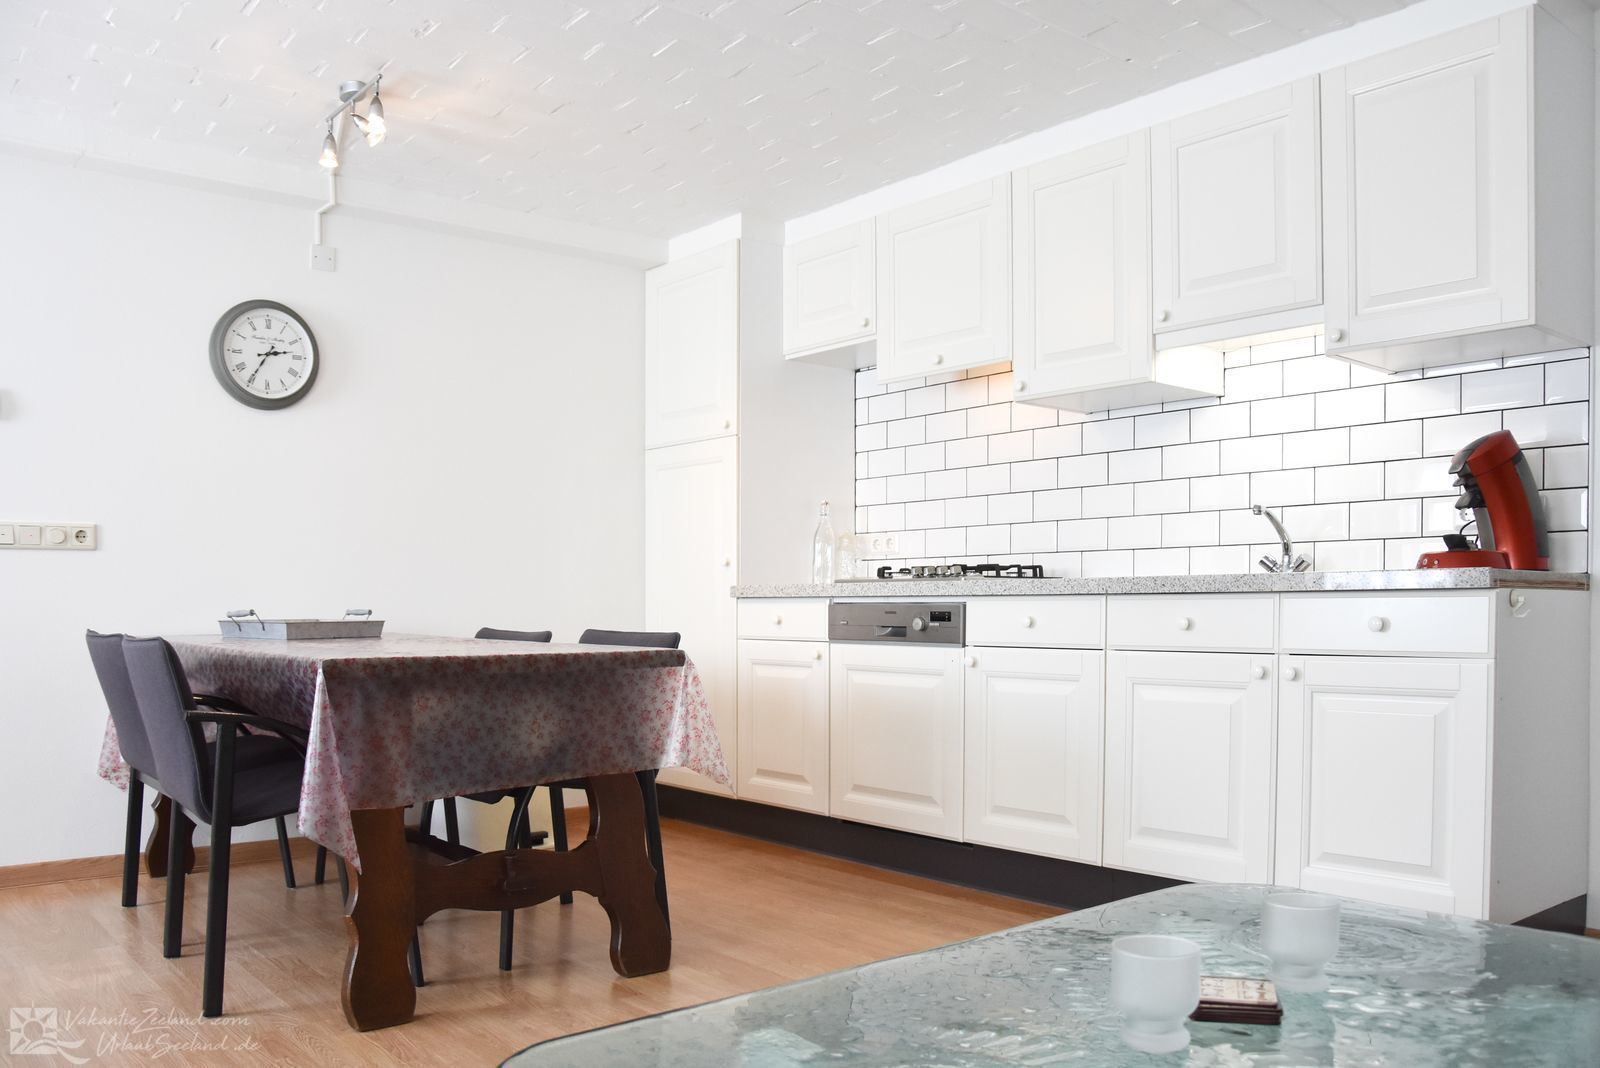 Kitchen-Gallery-Image-003